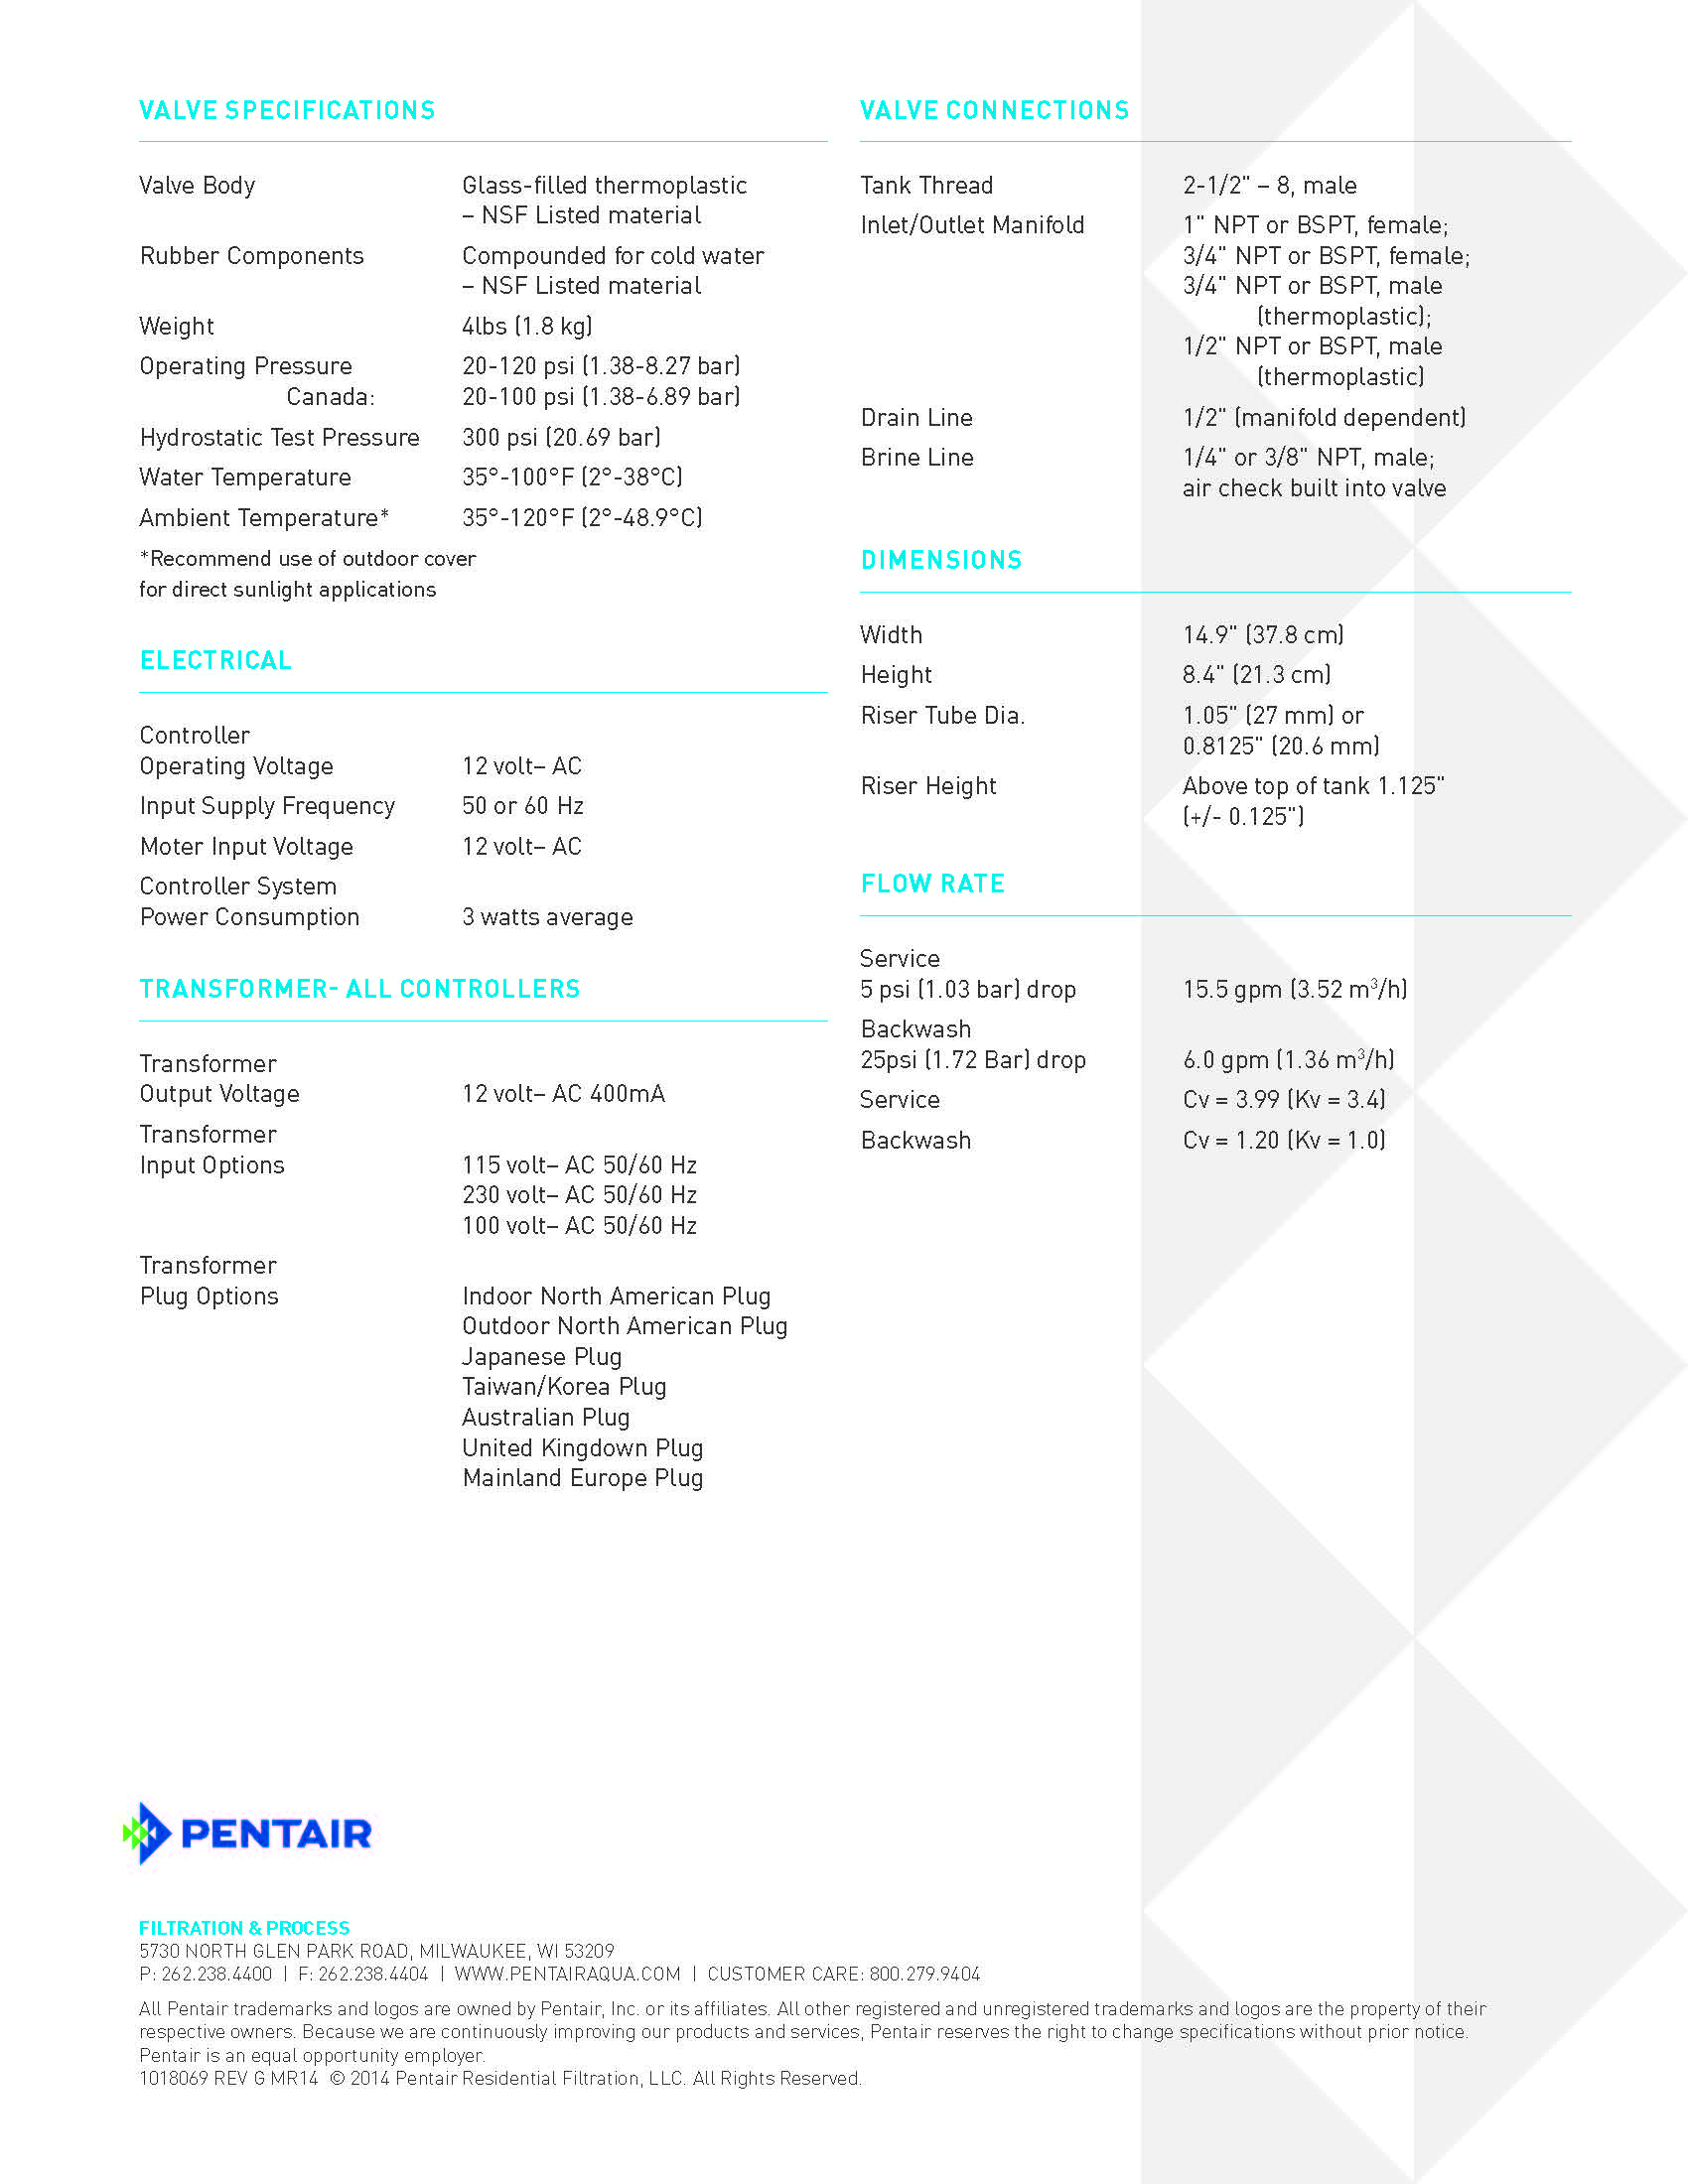 255-valve-spec-sheet-1018069_Page_2